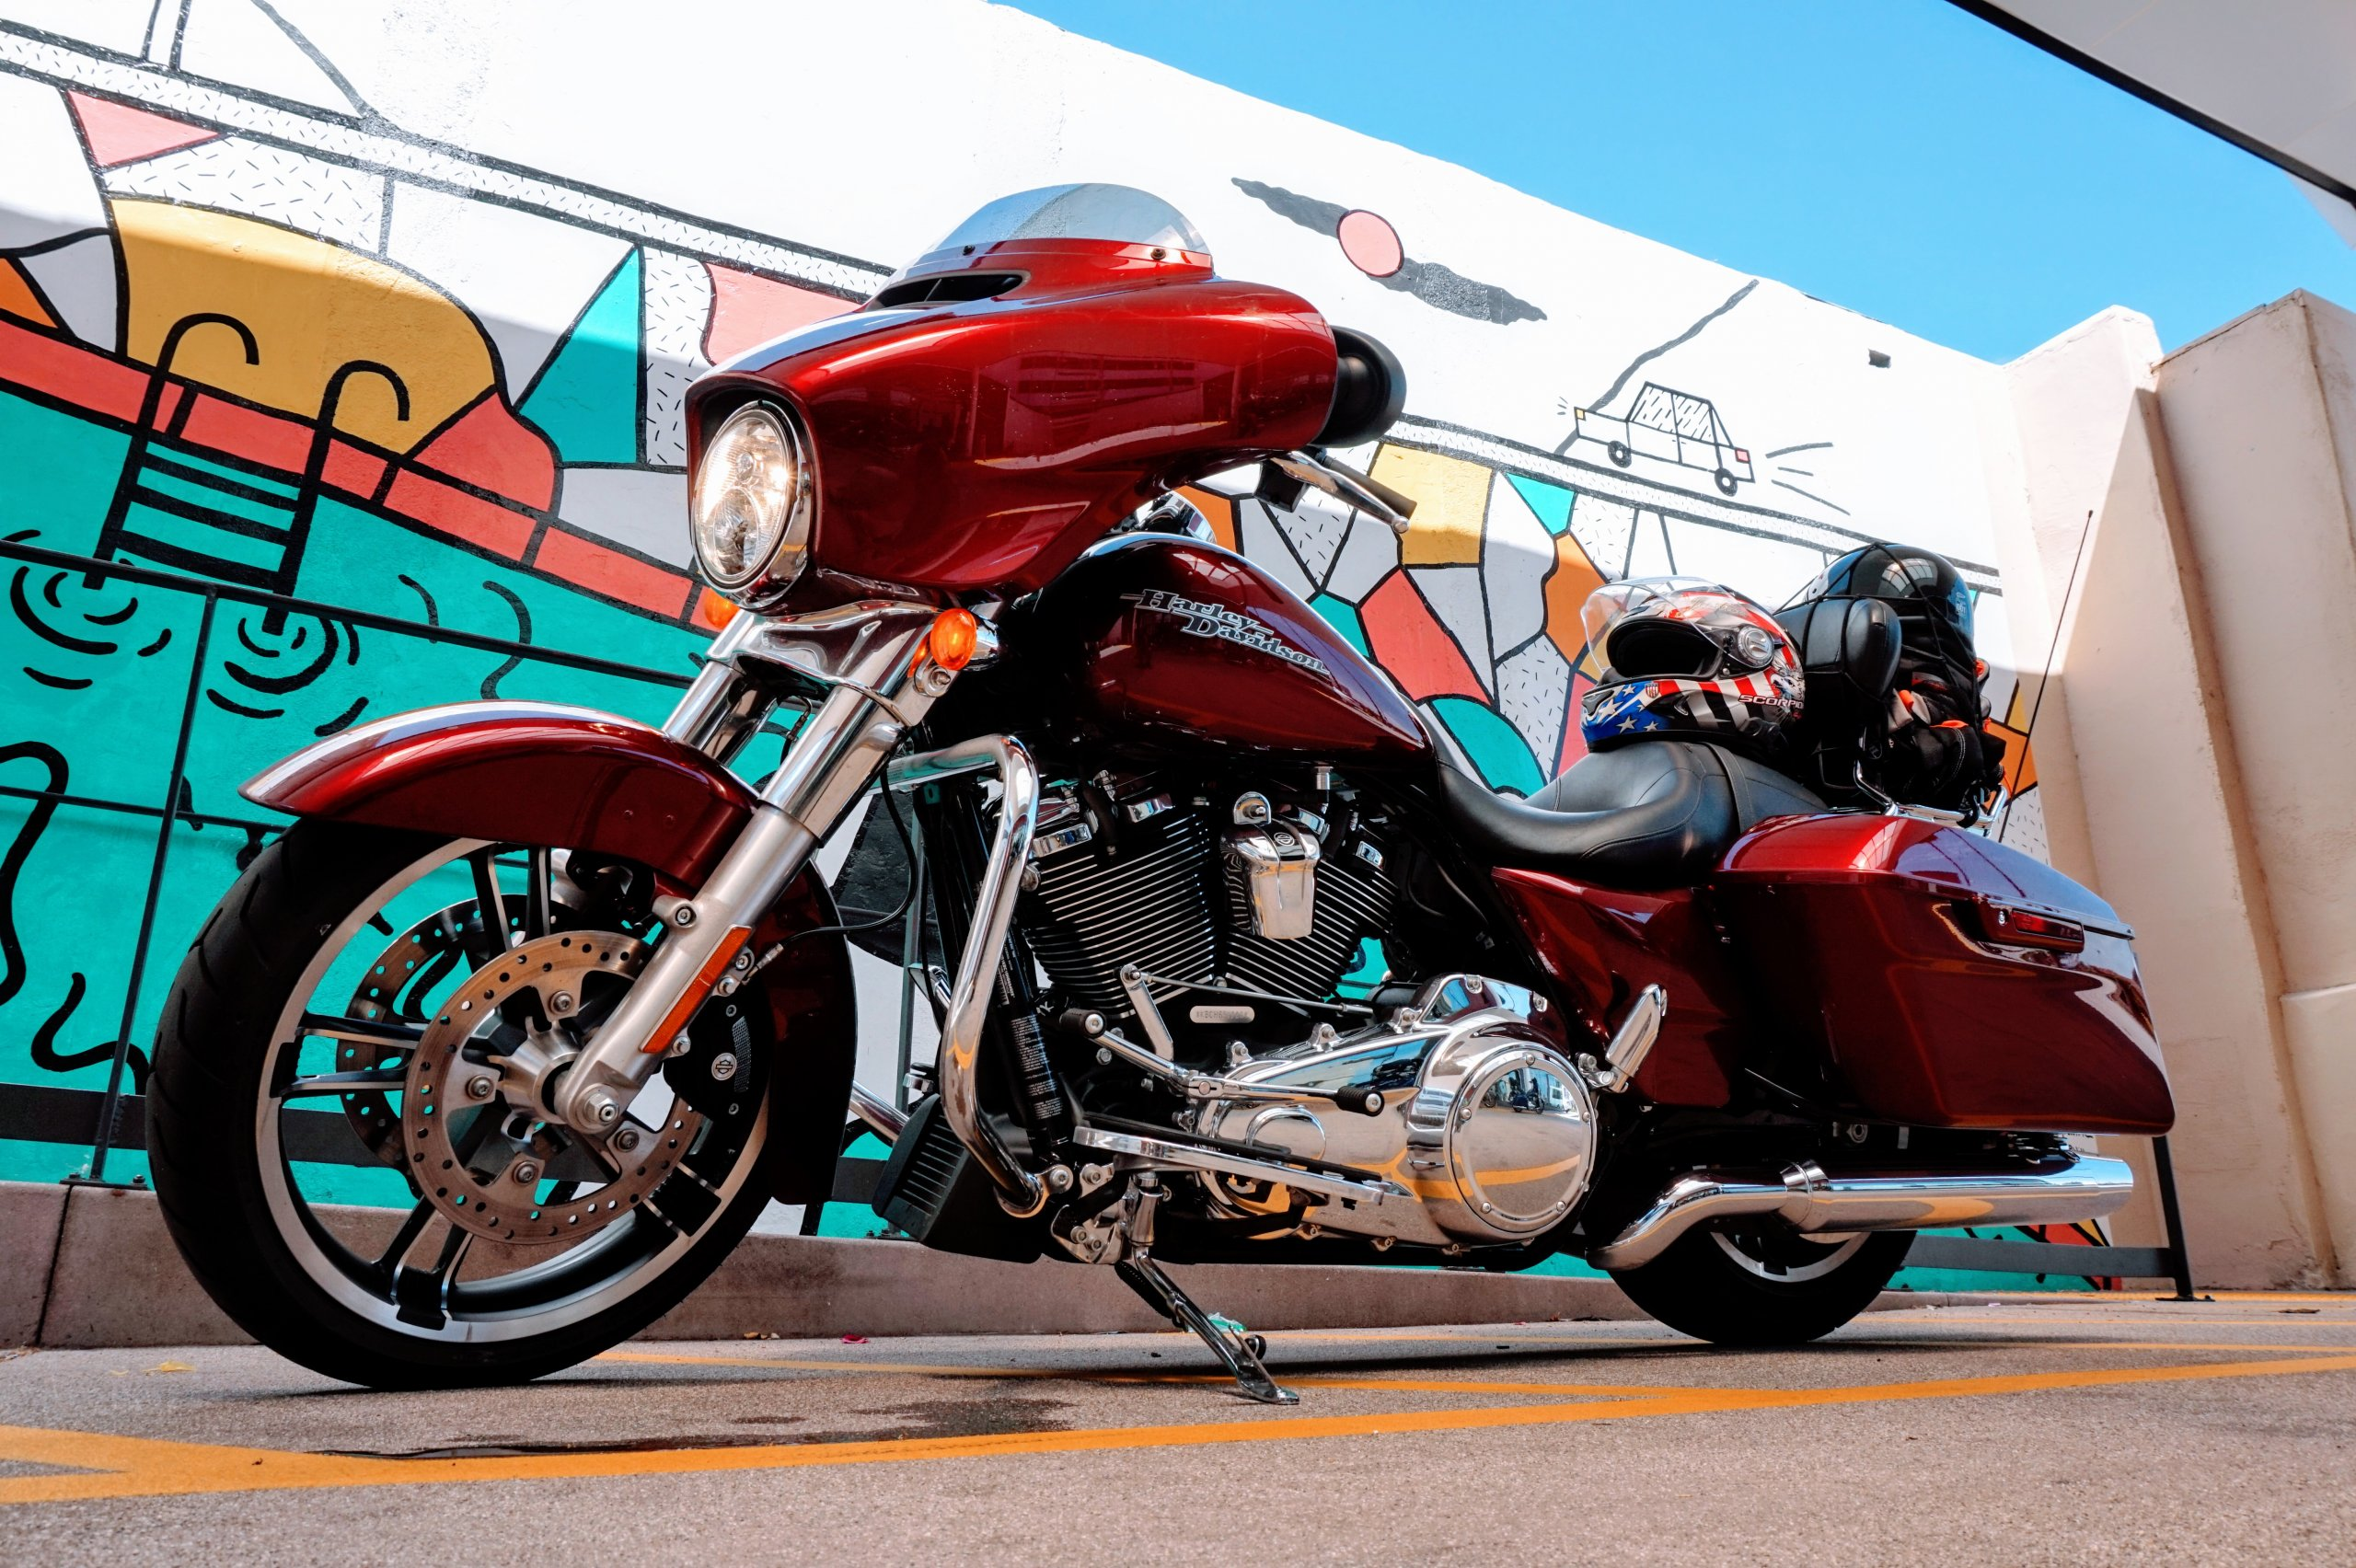 Harley Davidson California Dreamin' Road Trip